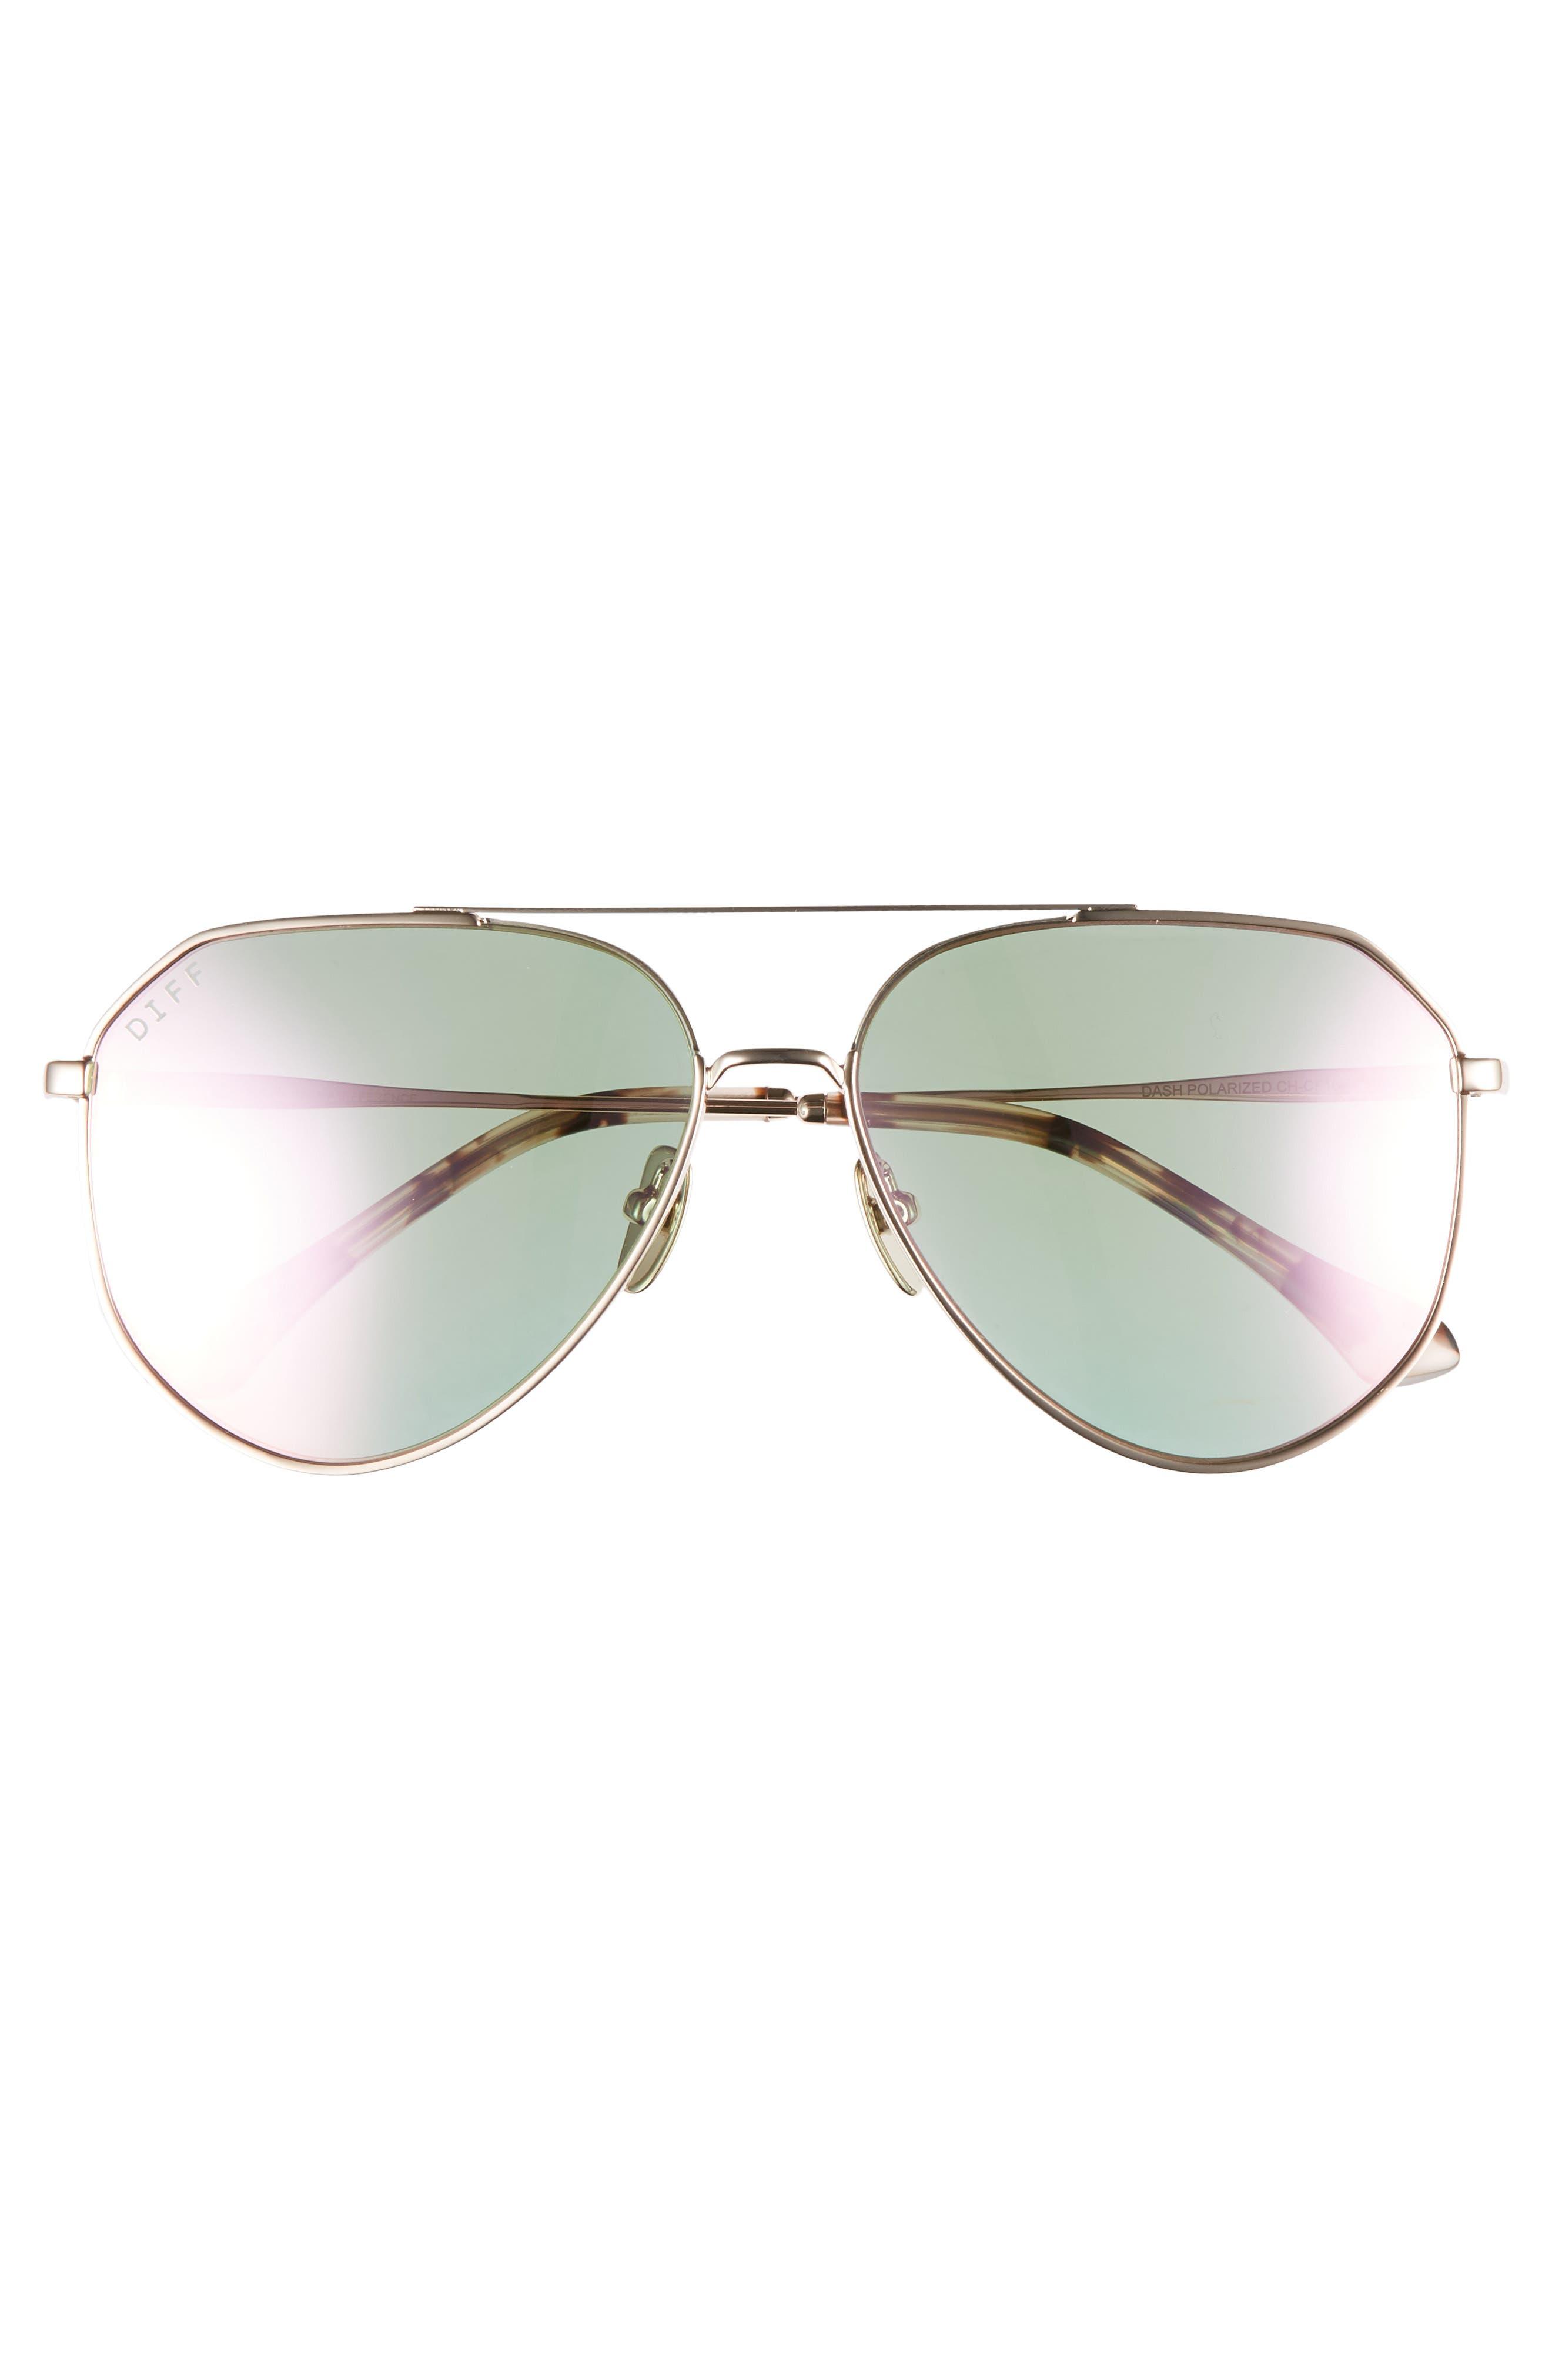 Dash 58mm Aviator Sunglasses,                             Alternate thumbnail 3, color,                             CHAMPAGNE